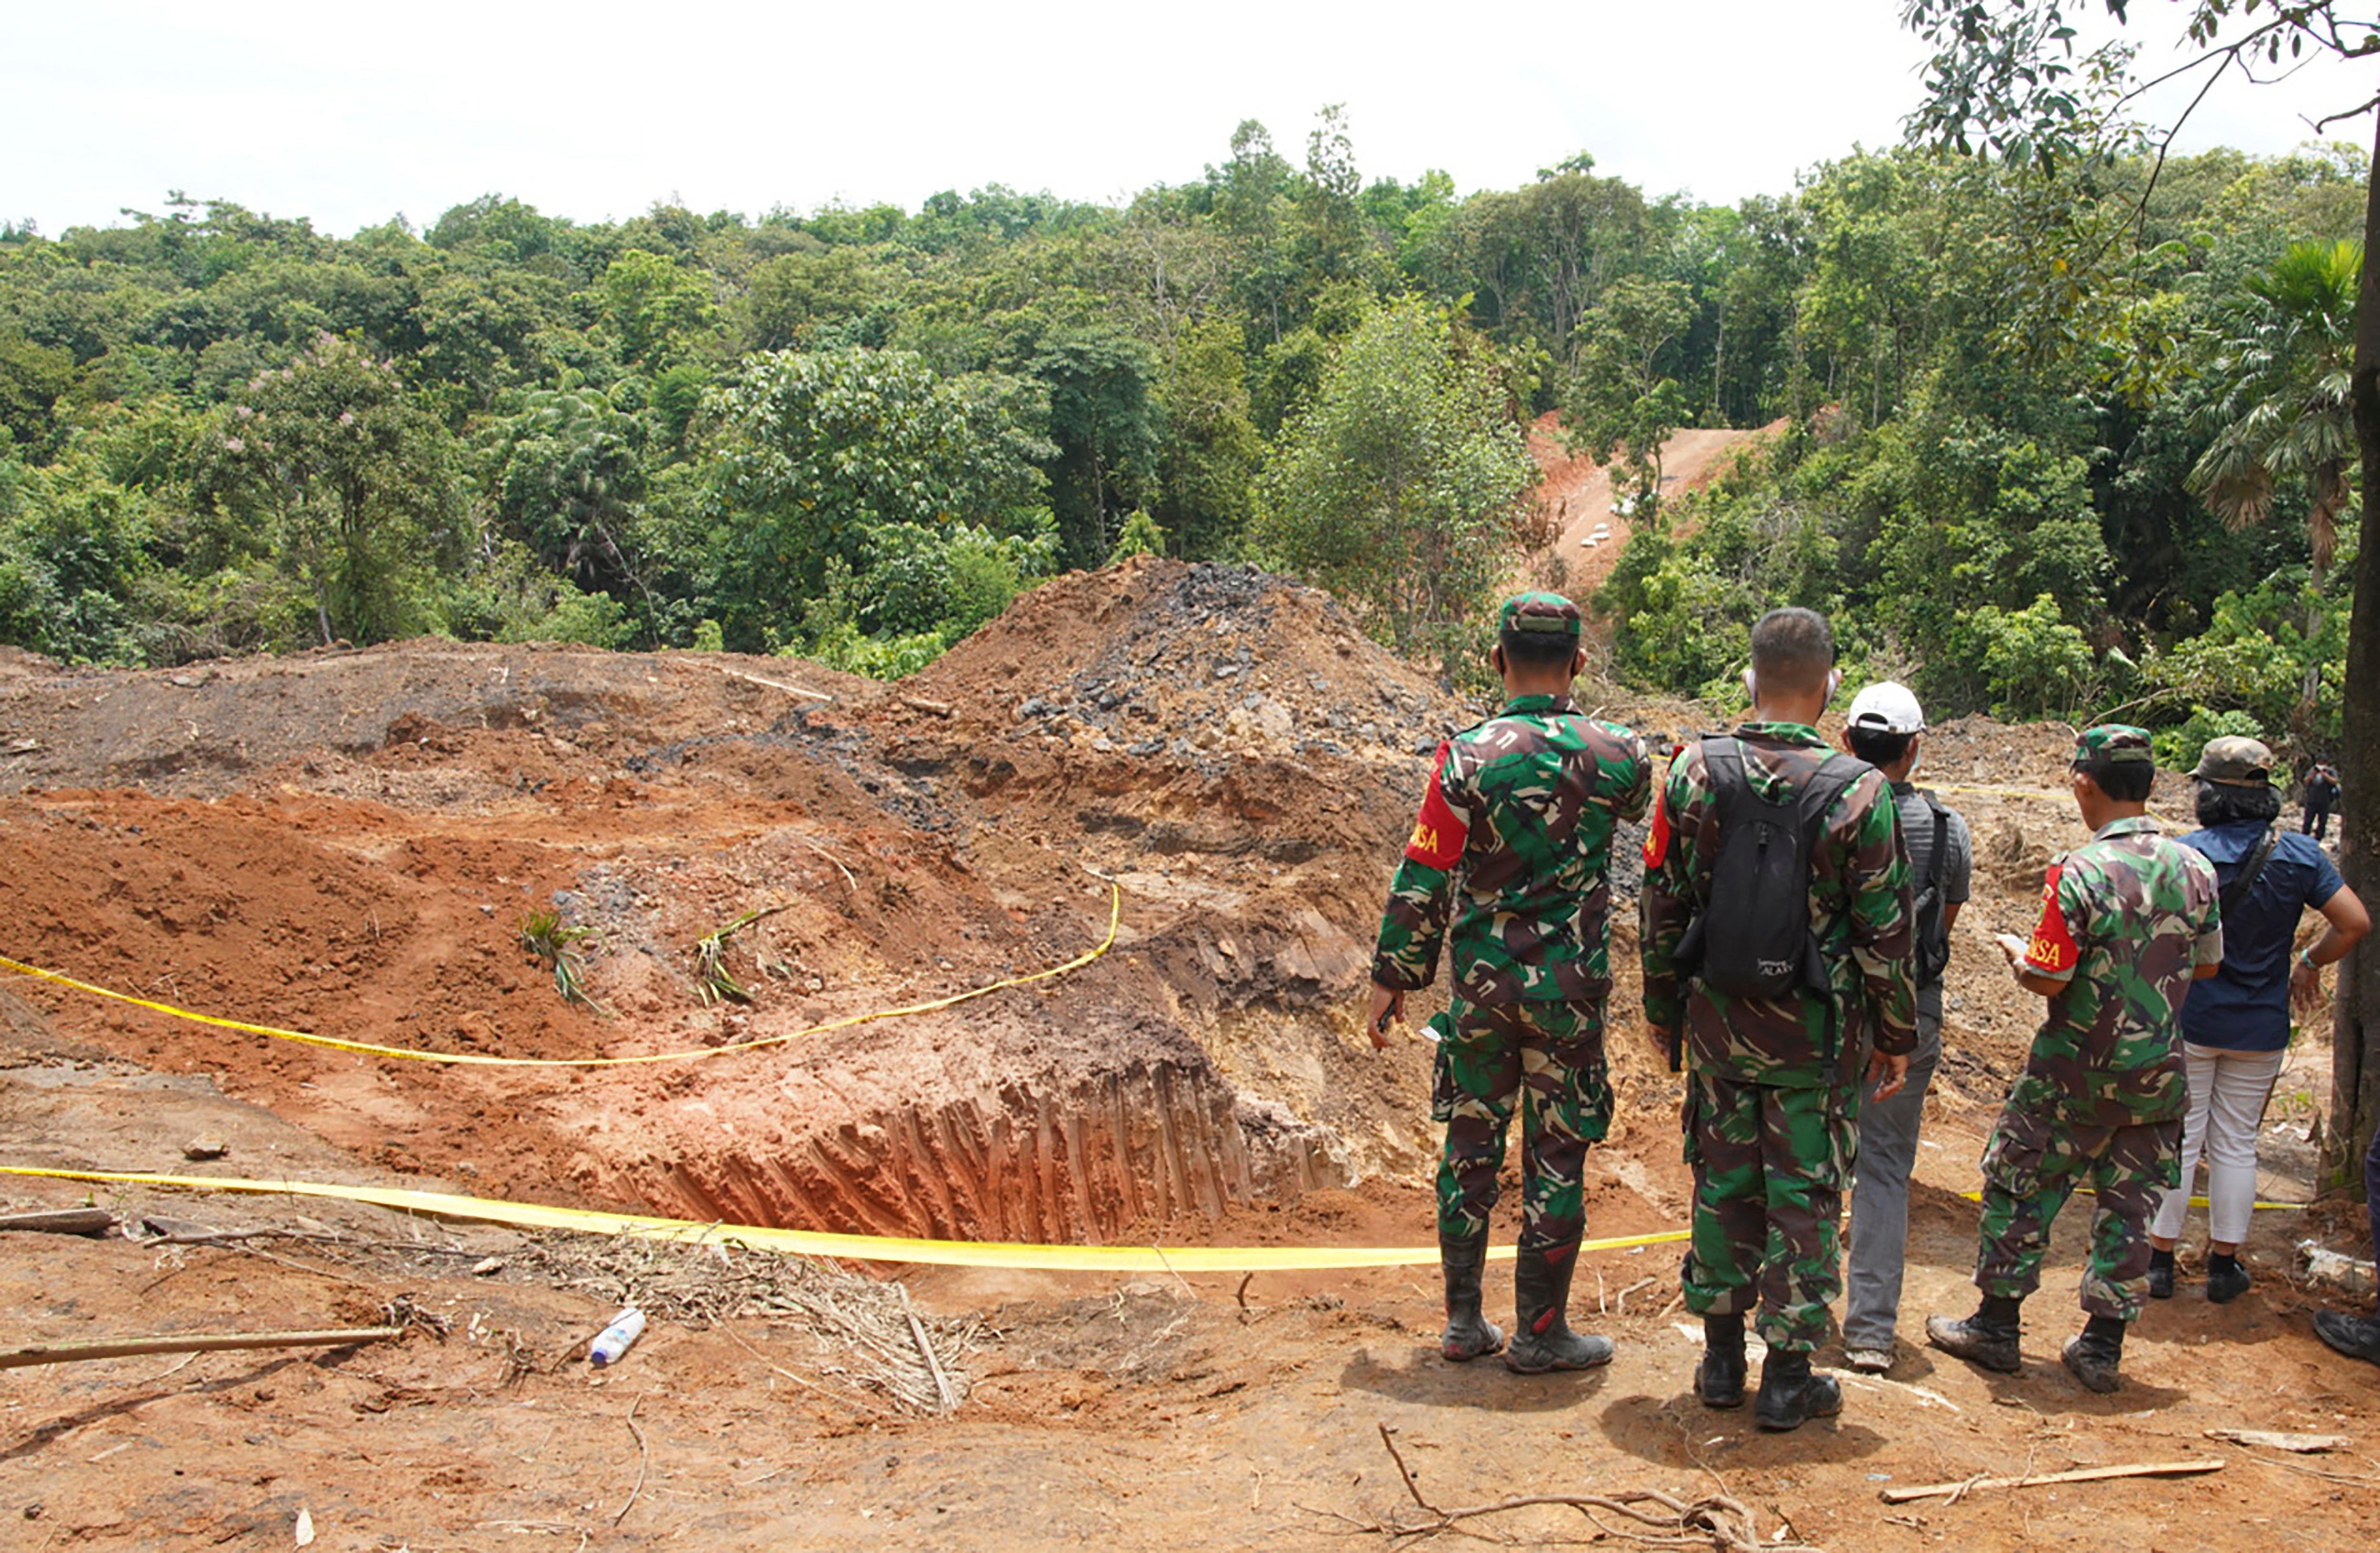 Landslide kills 11 miners in Indonesia - independent